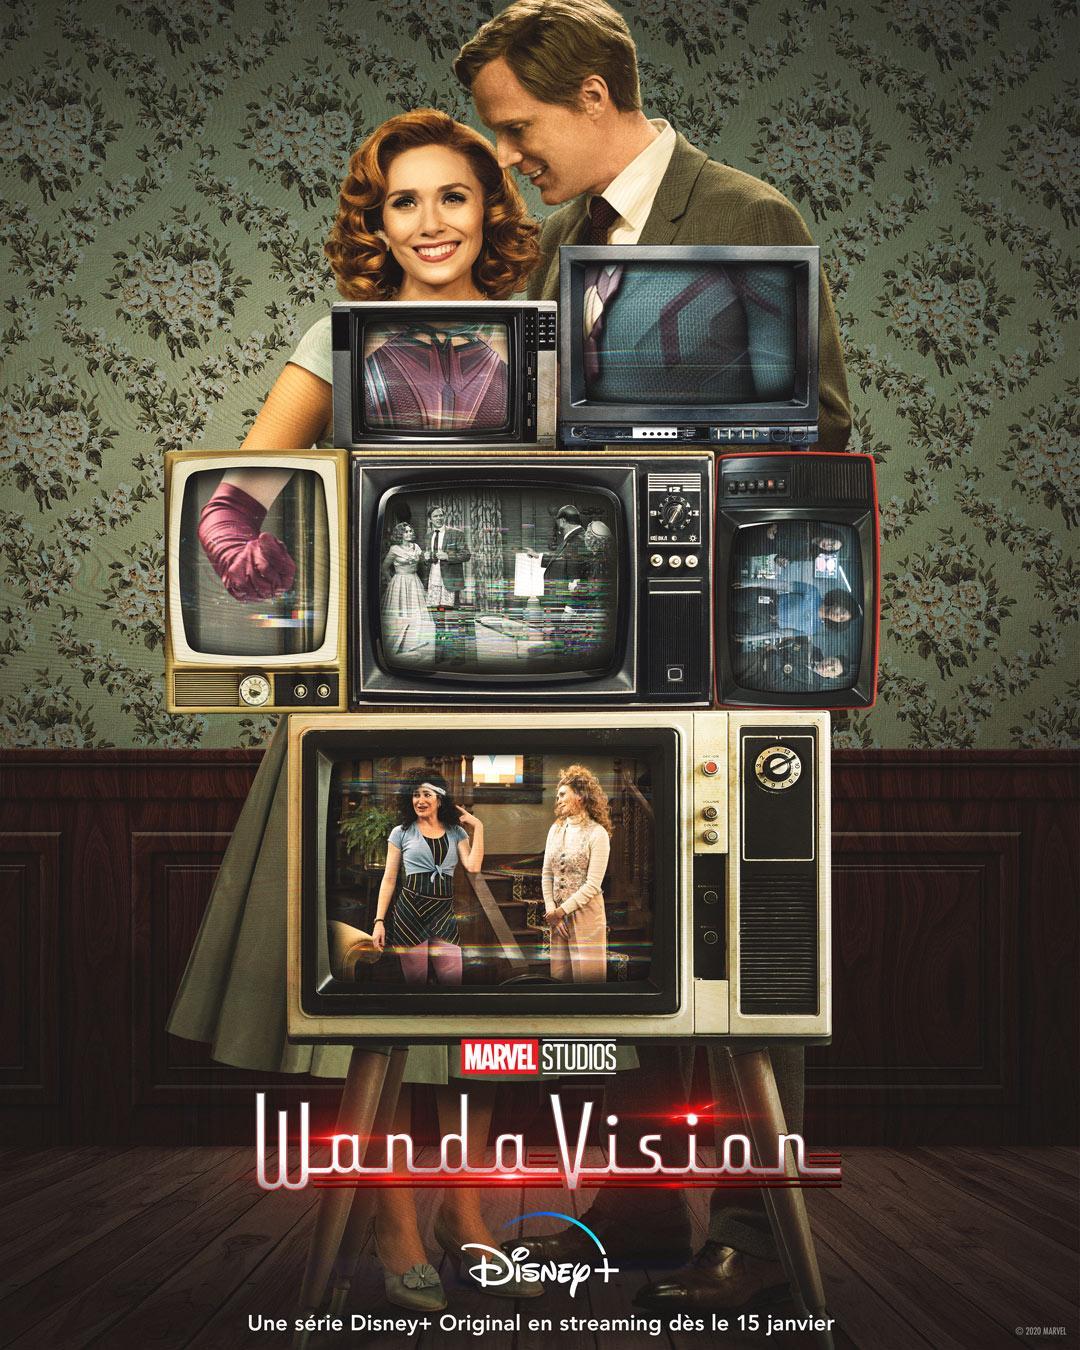 Wandavision s1 poster2